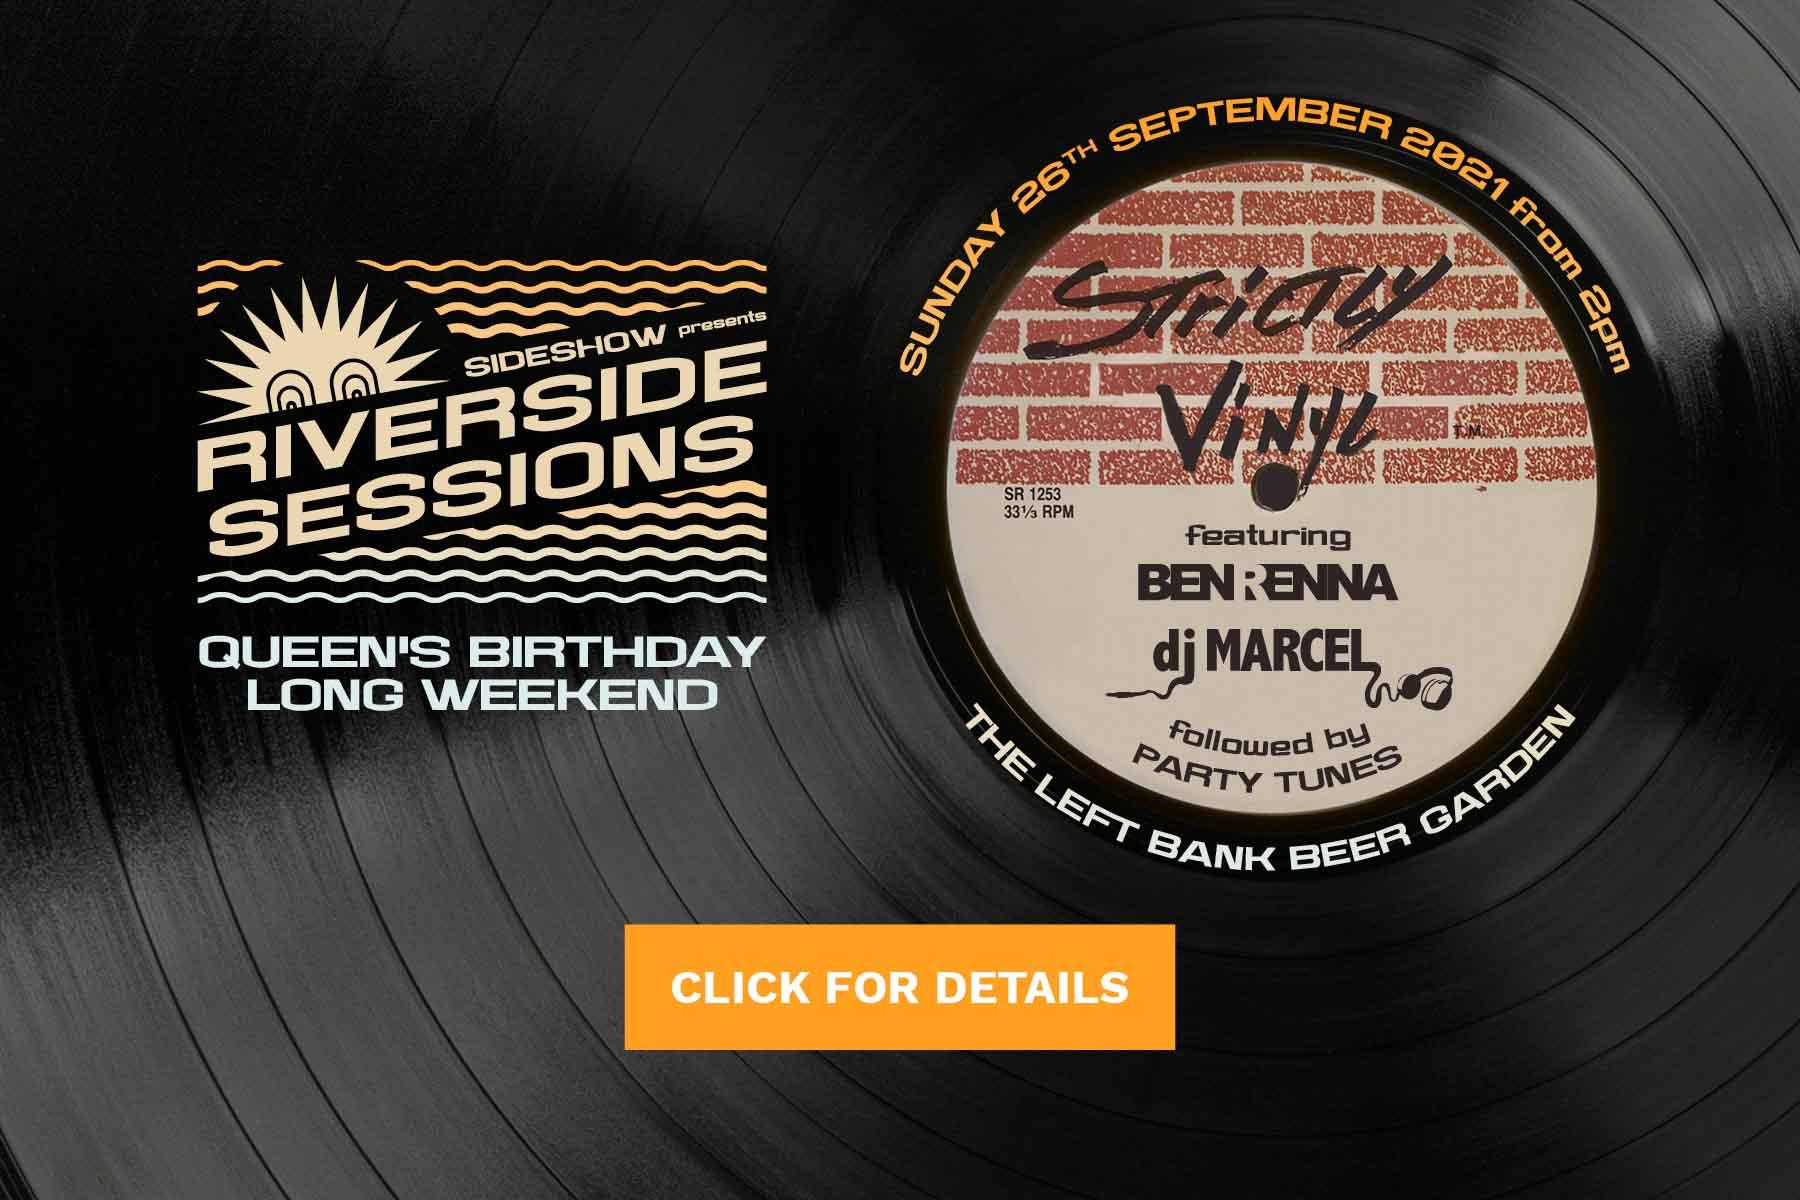 Riverside Session - Queen's Birthday 2021